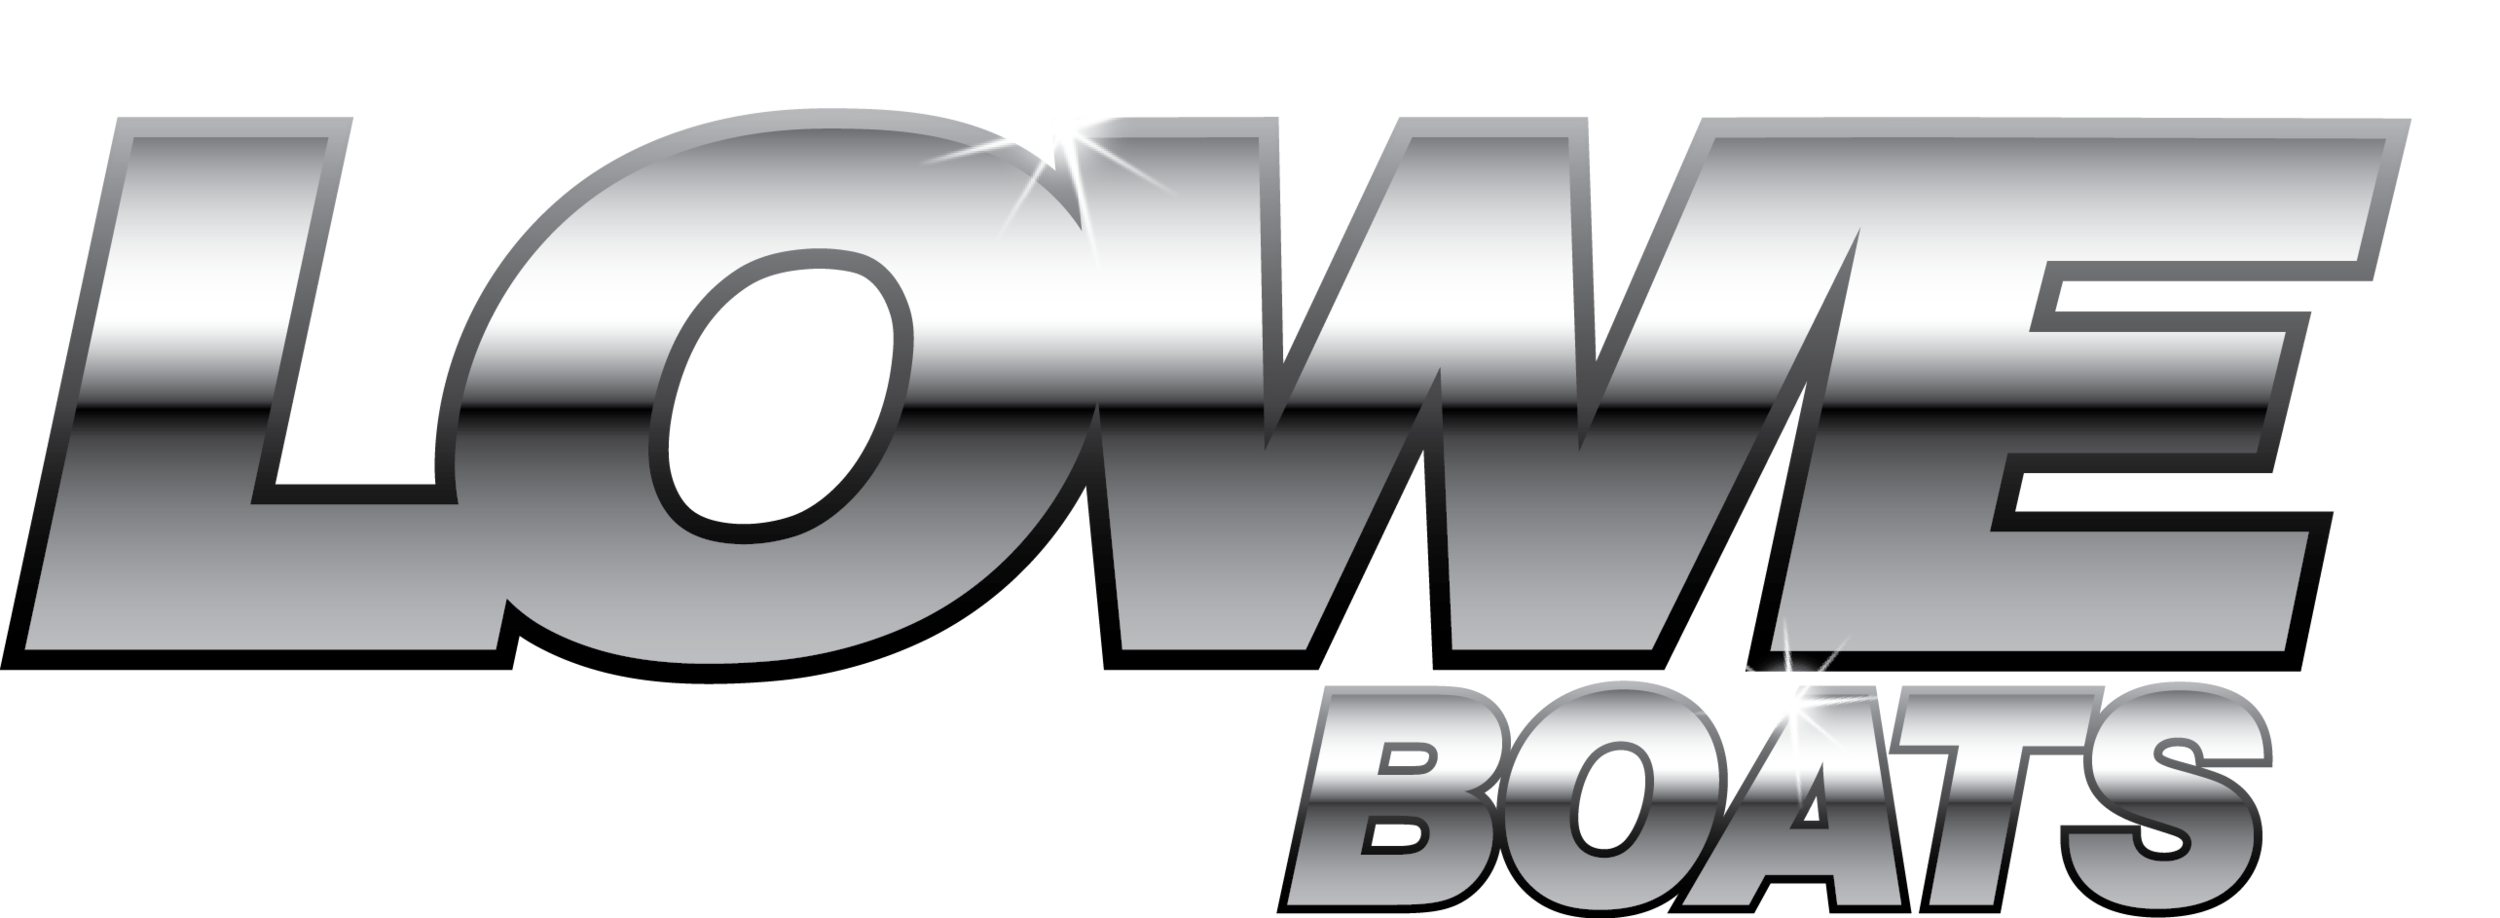 Lowe_Boats_Logo.png